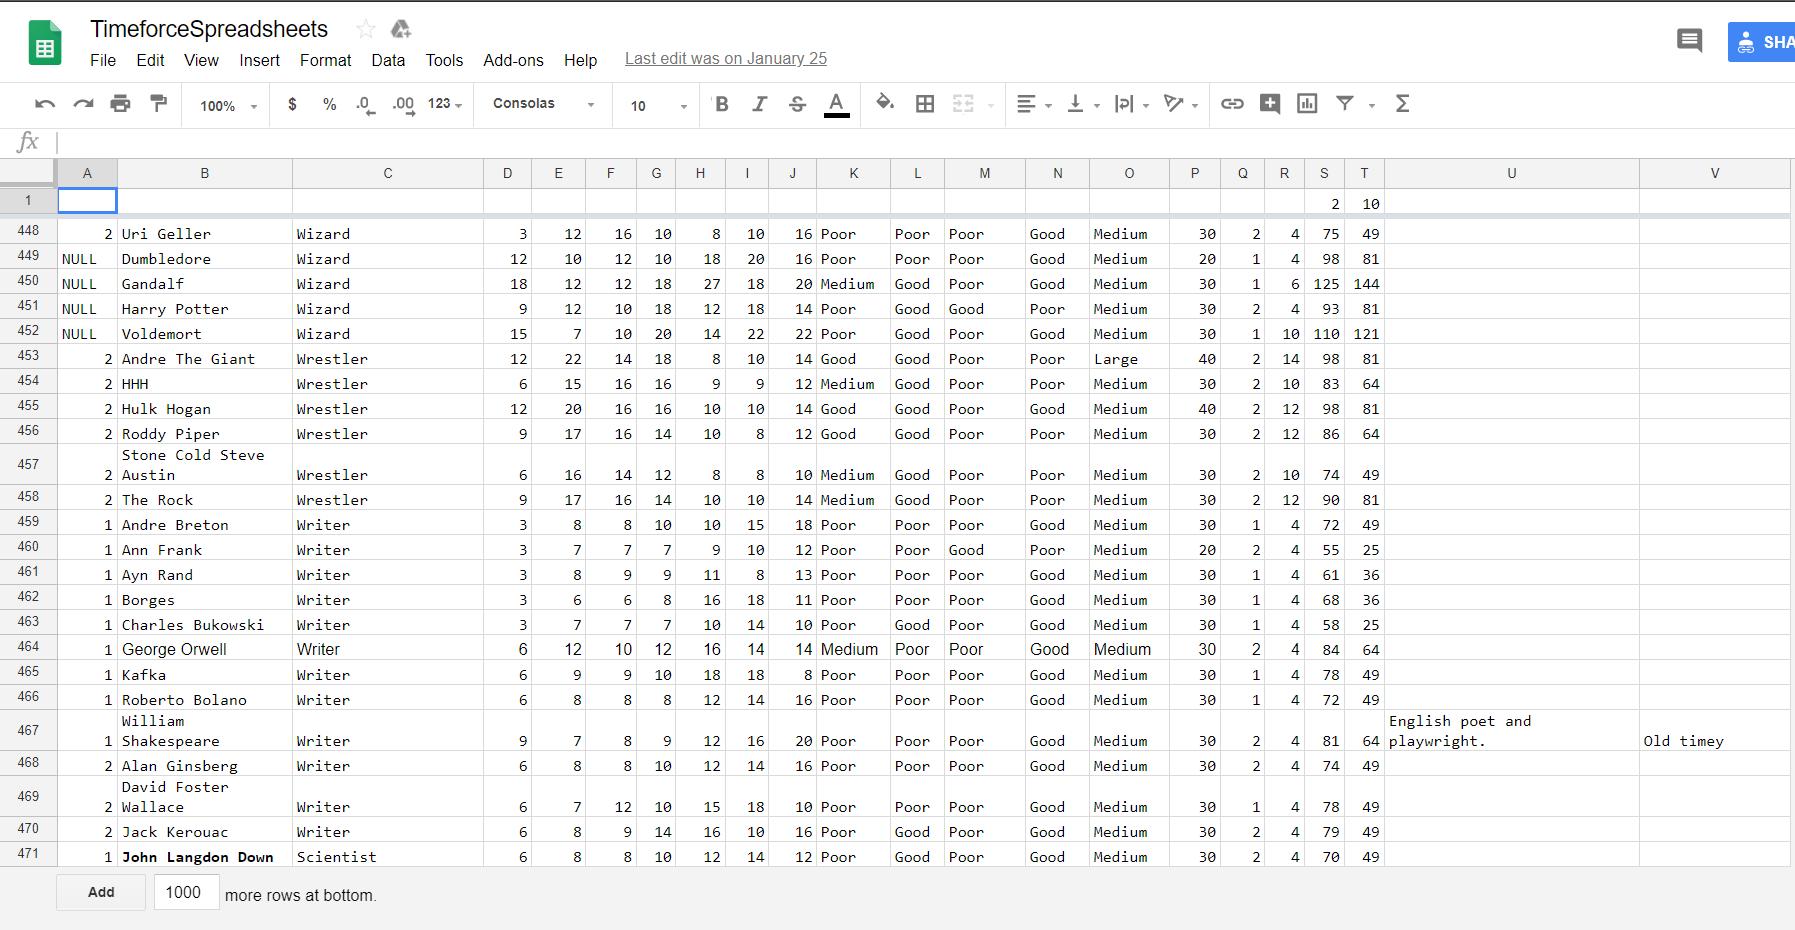 Timeforce Spreadsheet